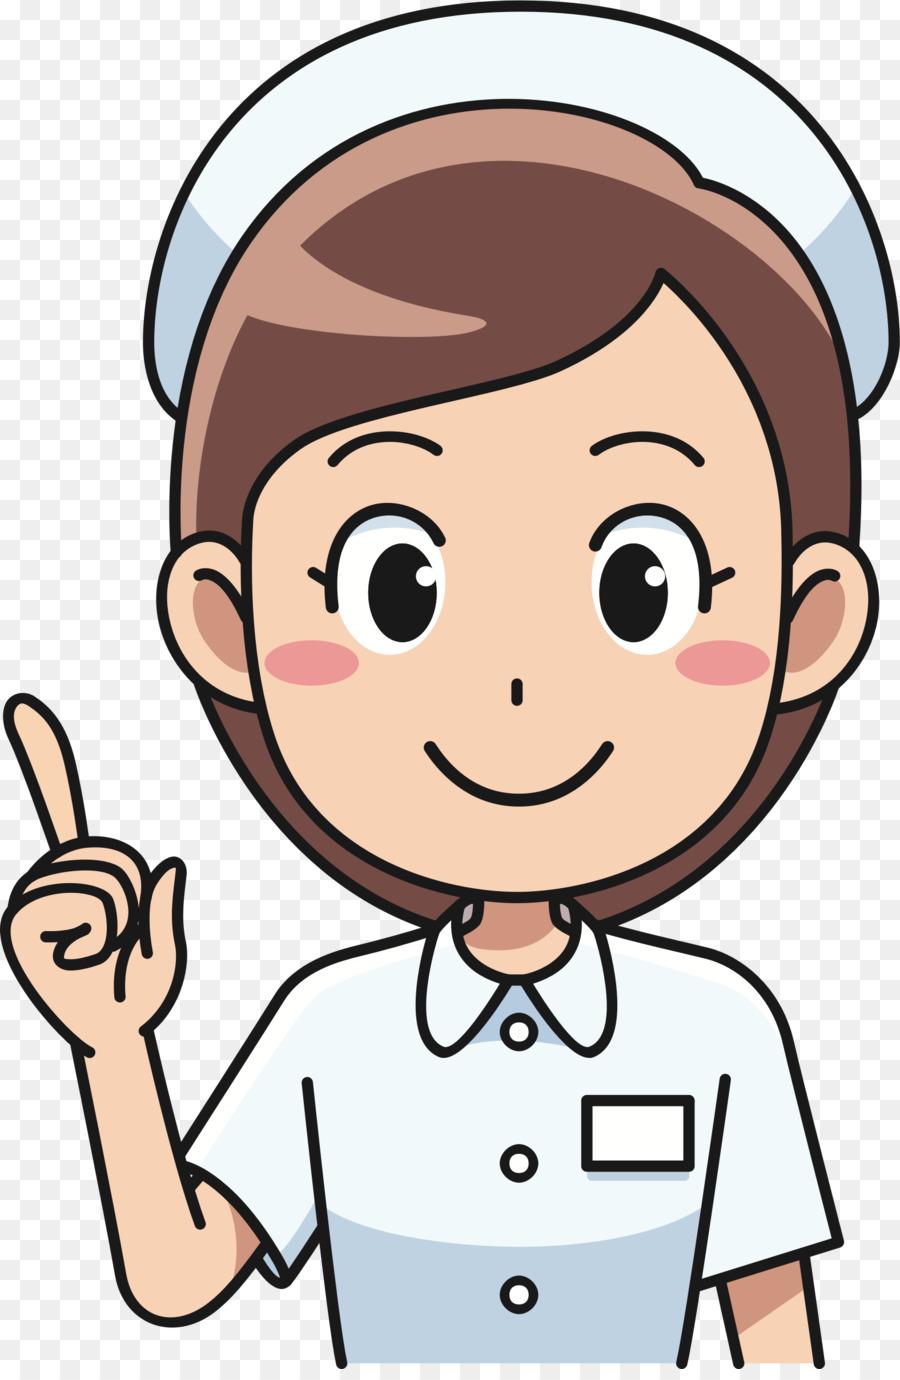 school nursing nurse medicine clip art nurse clipart png download rh kisspng com nursery clipart nurse clip art free